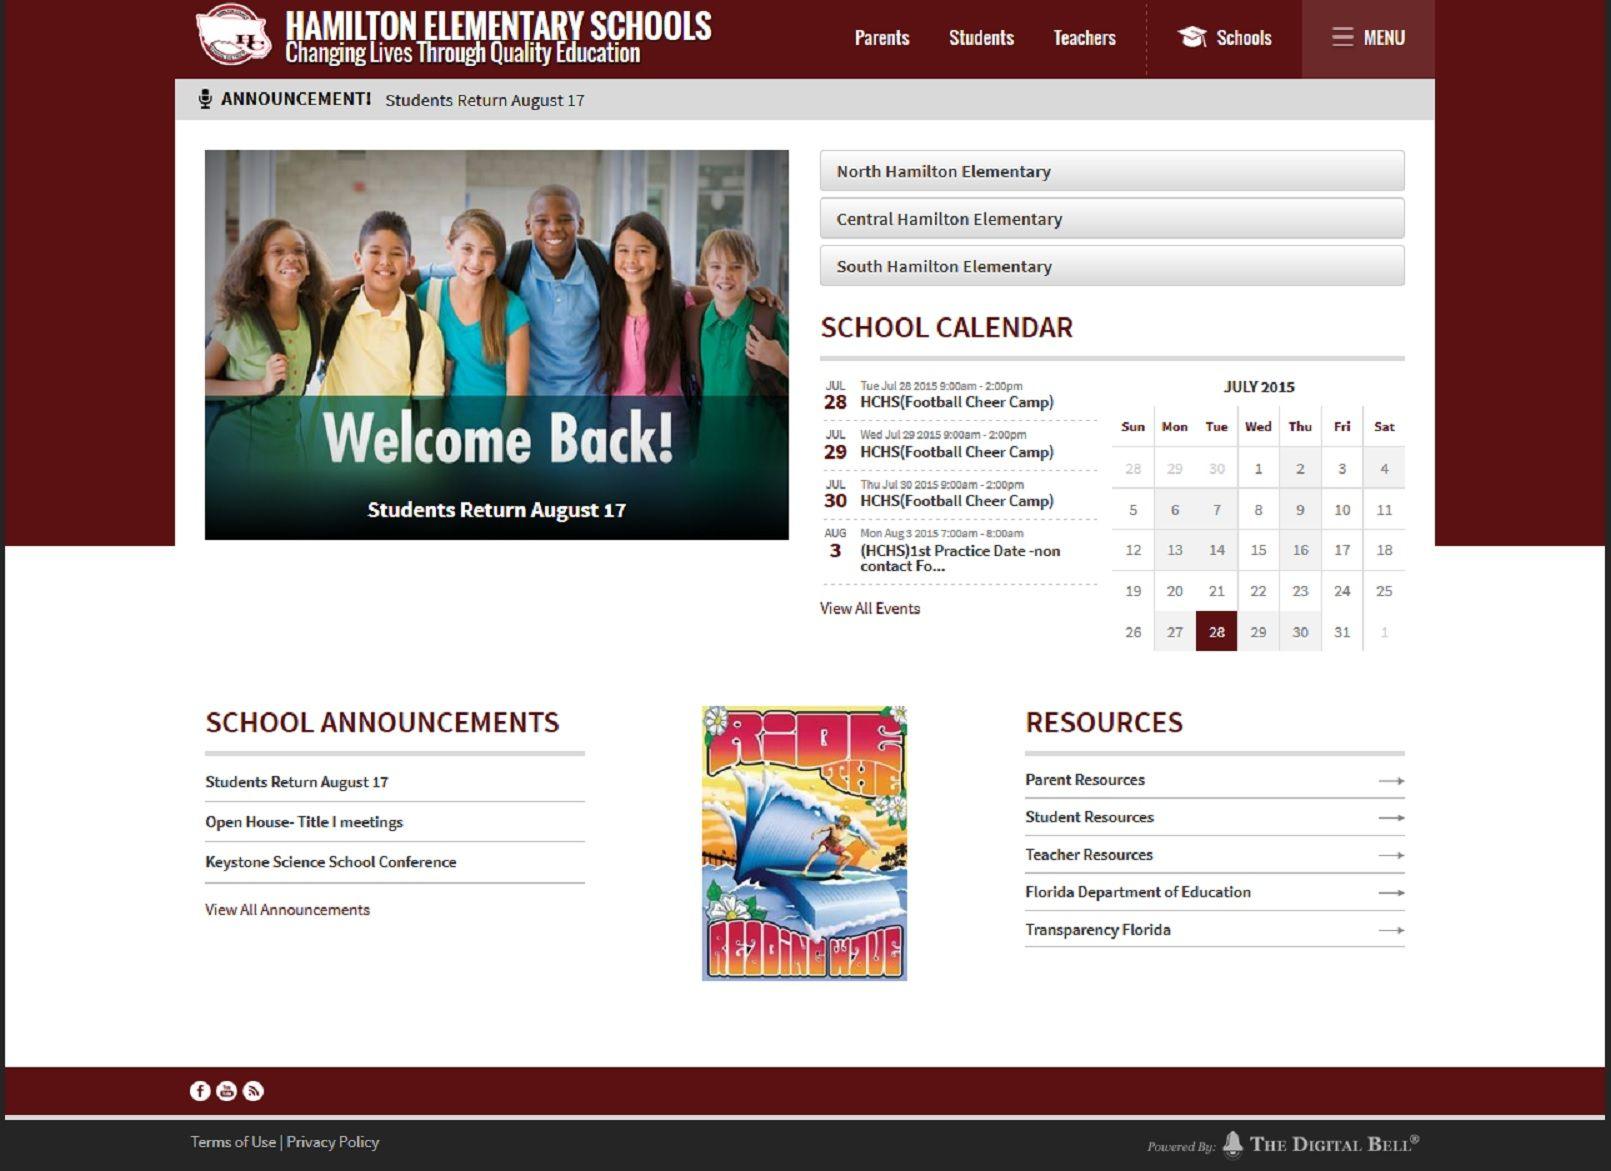 Hamilton Elementary Schools, Hamilton, FL Elementary